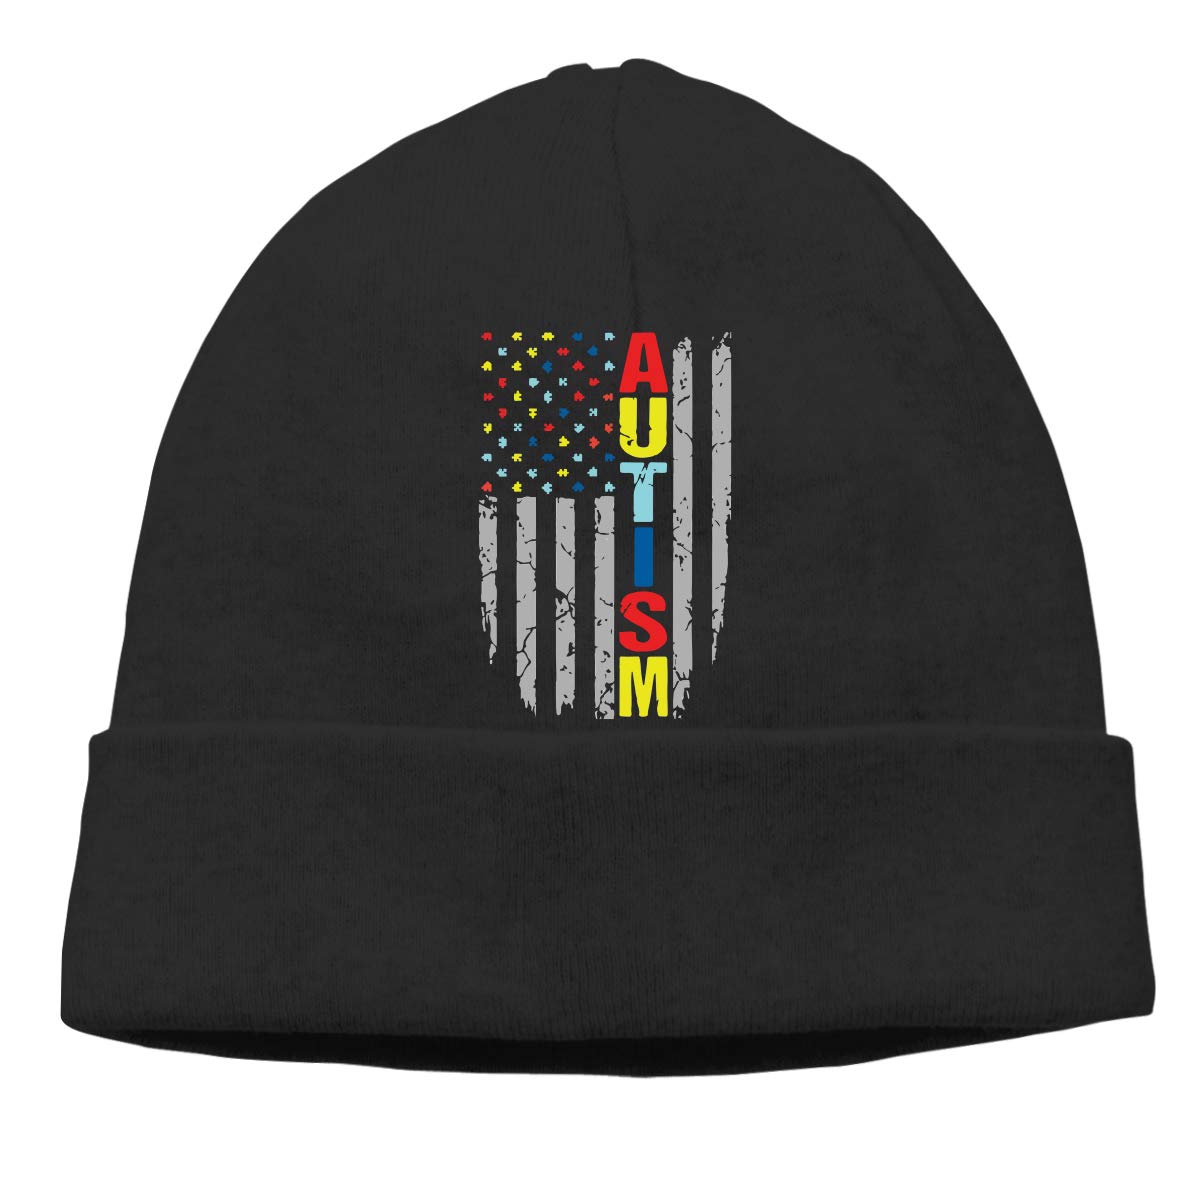 COLLJL8 Unisex Autism Awareness American Flag Outdoor Warm Beanies Hat Soft Winter Skull Caps